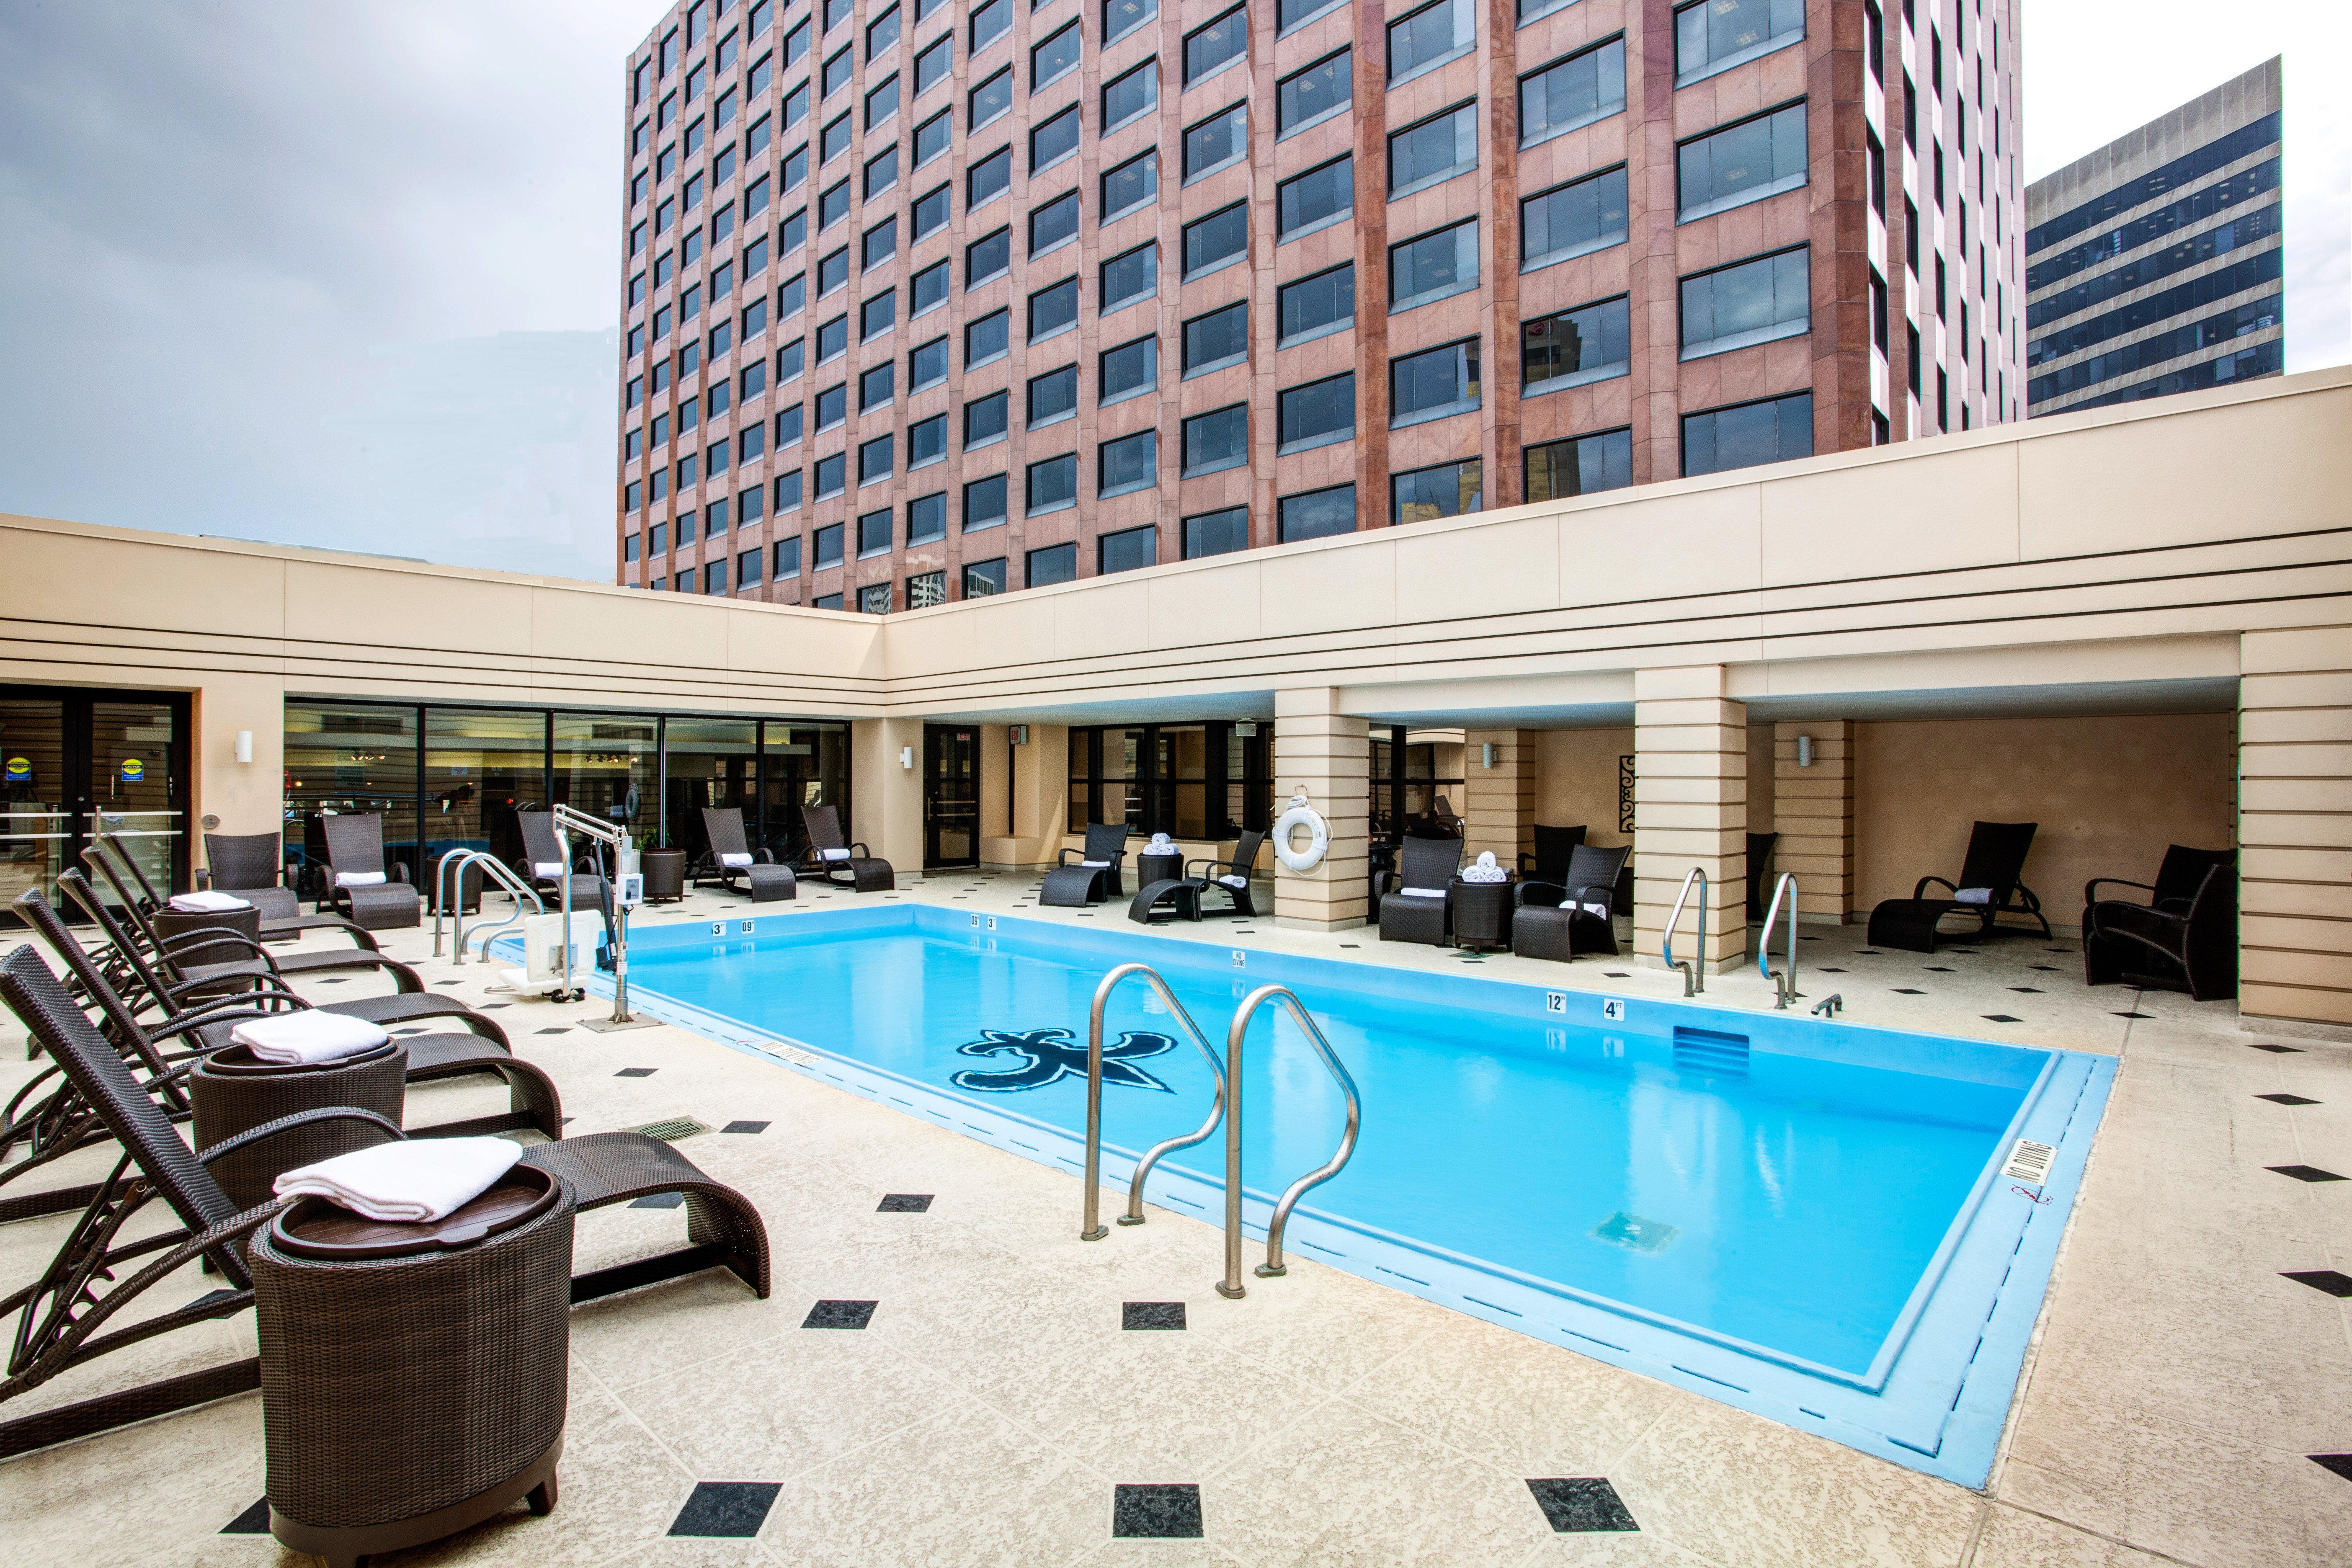 Play Pool Resort building swimming pool property leisure condominium home plaza